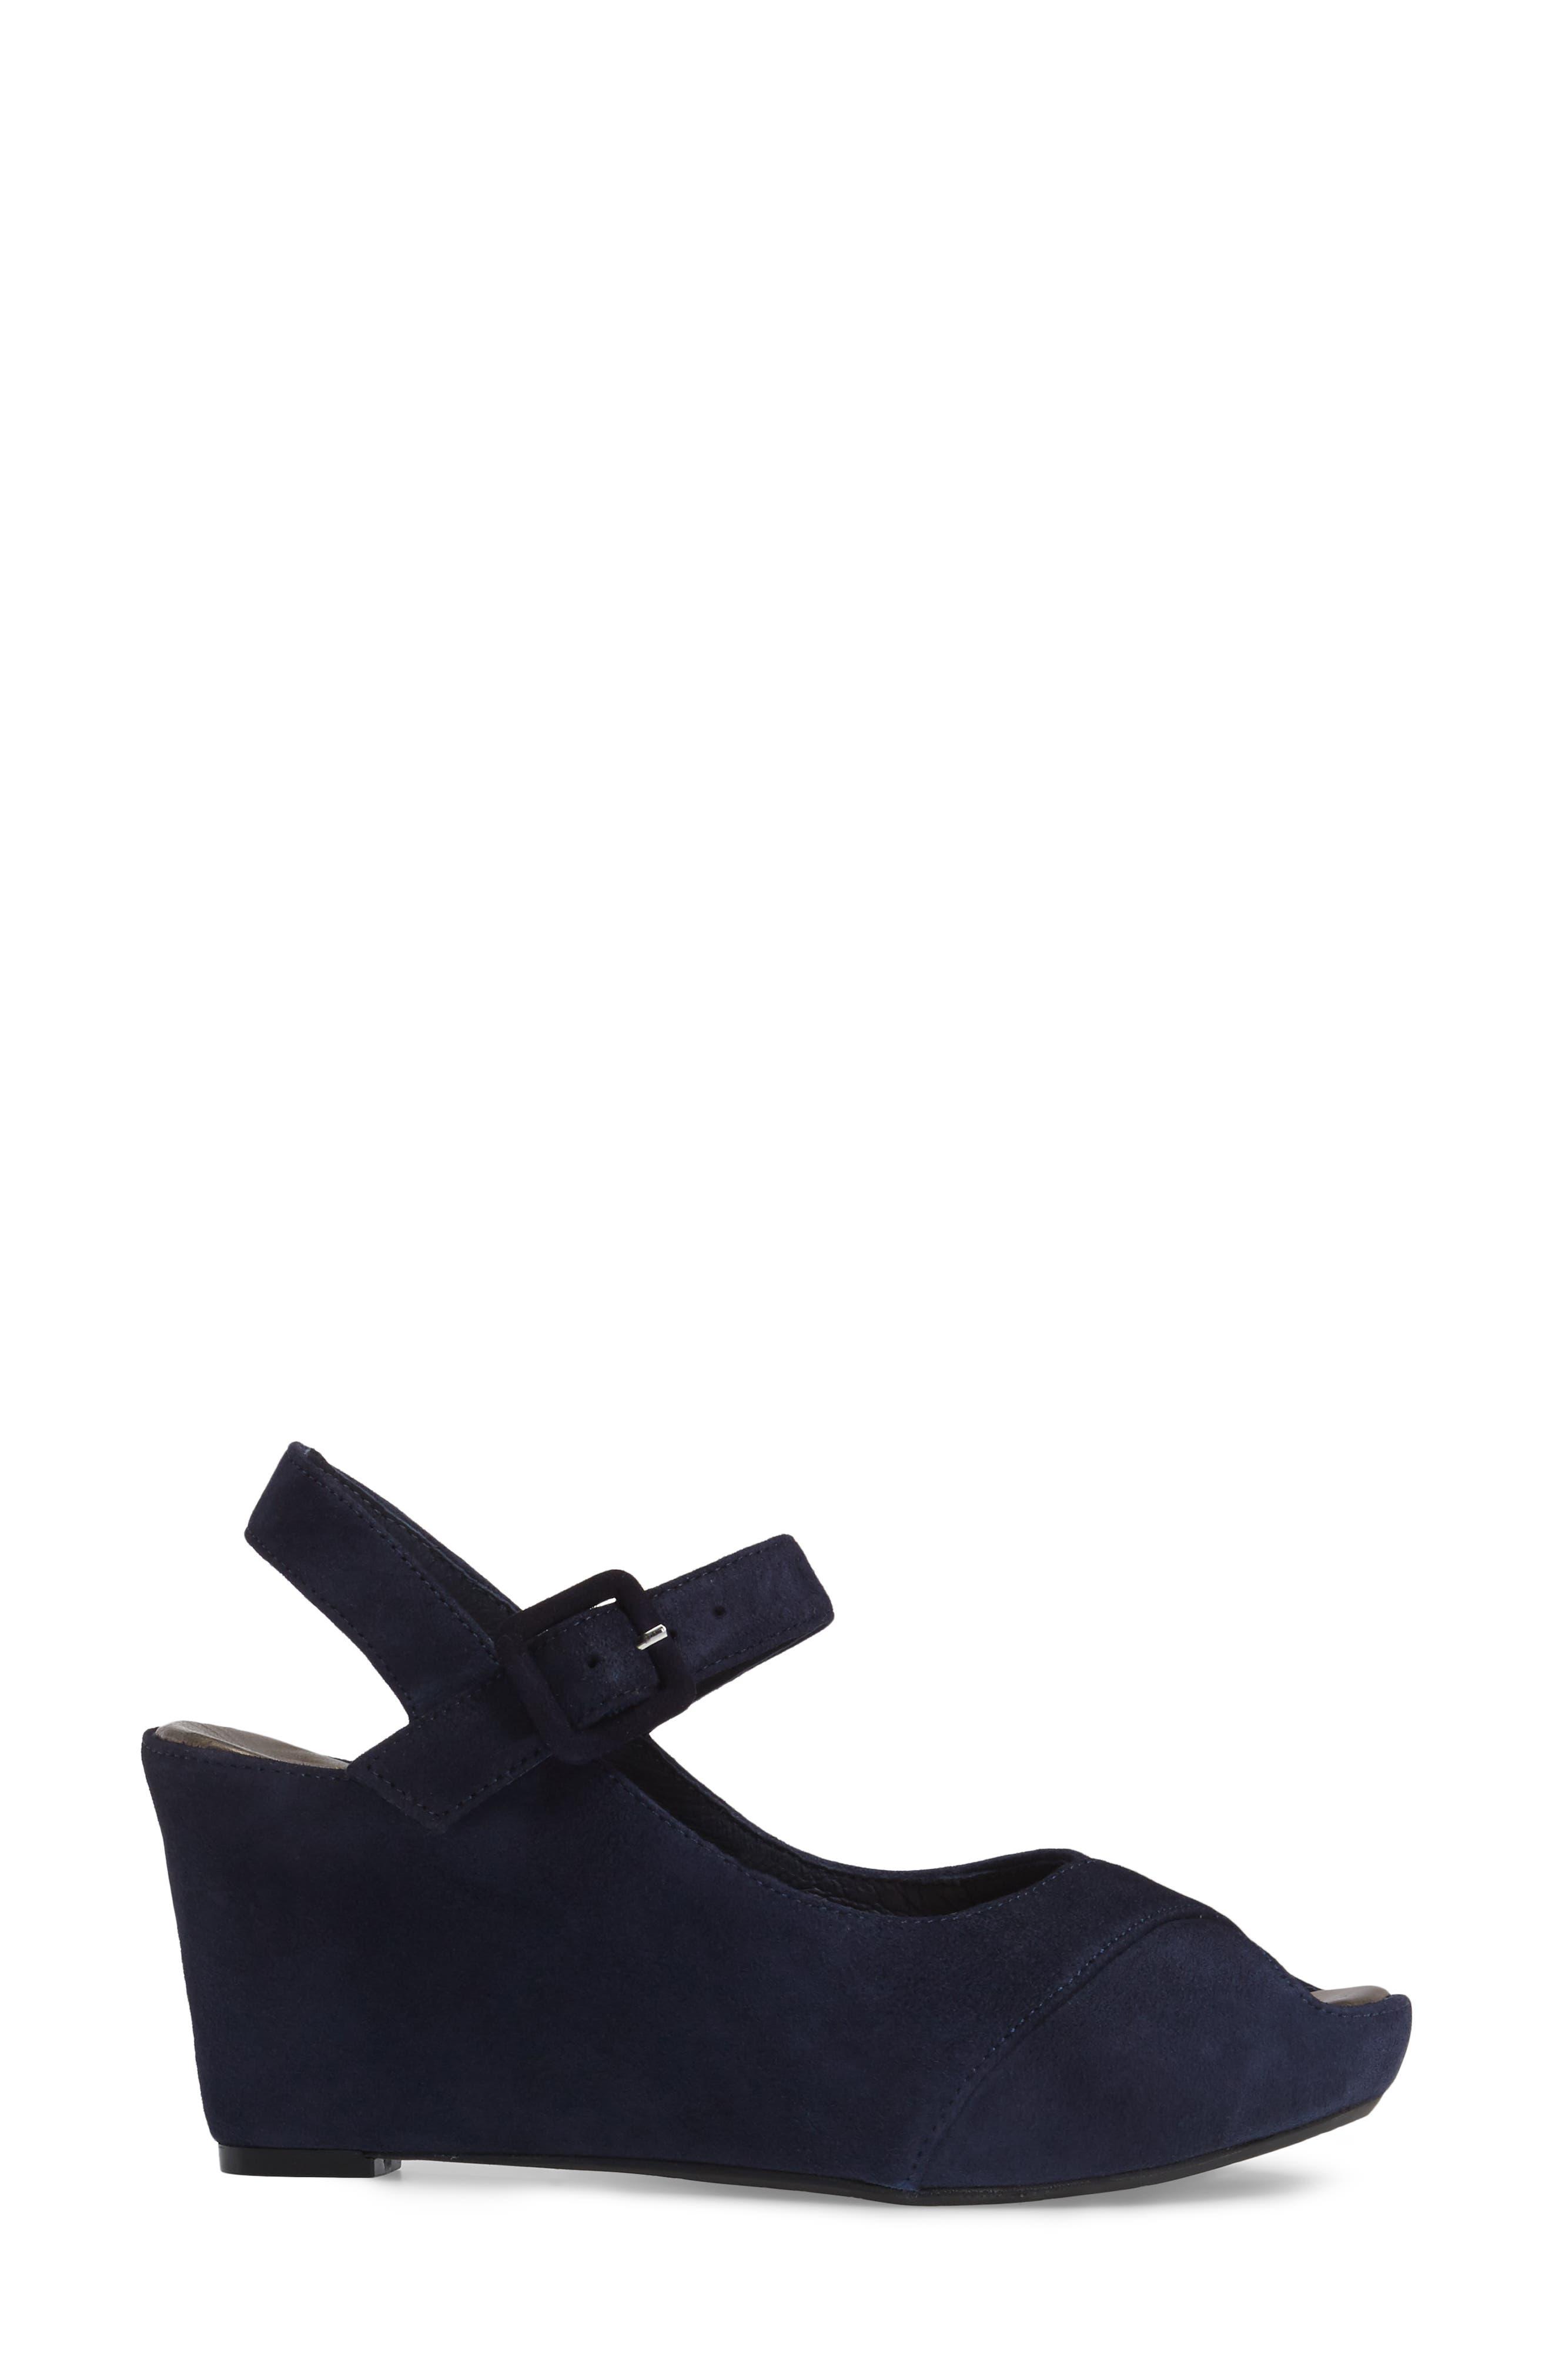 Tara Platform Wedge Sandal,                             Alternate thumbnail 3, color,                             NAVY SUEDE